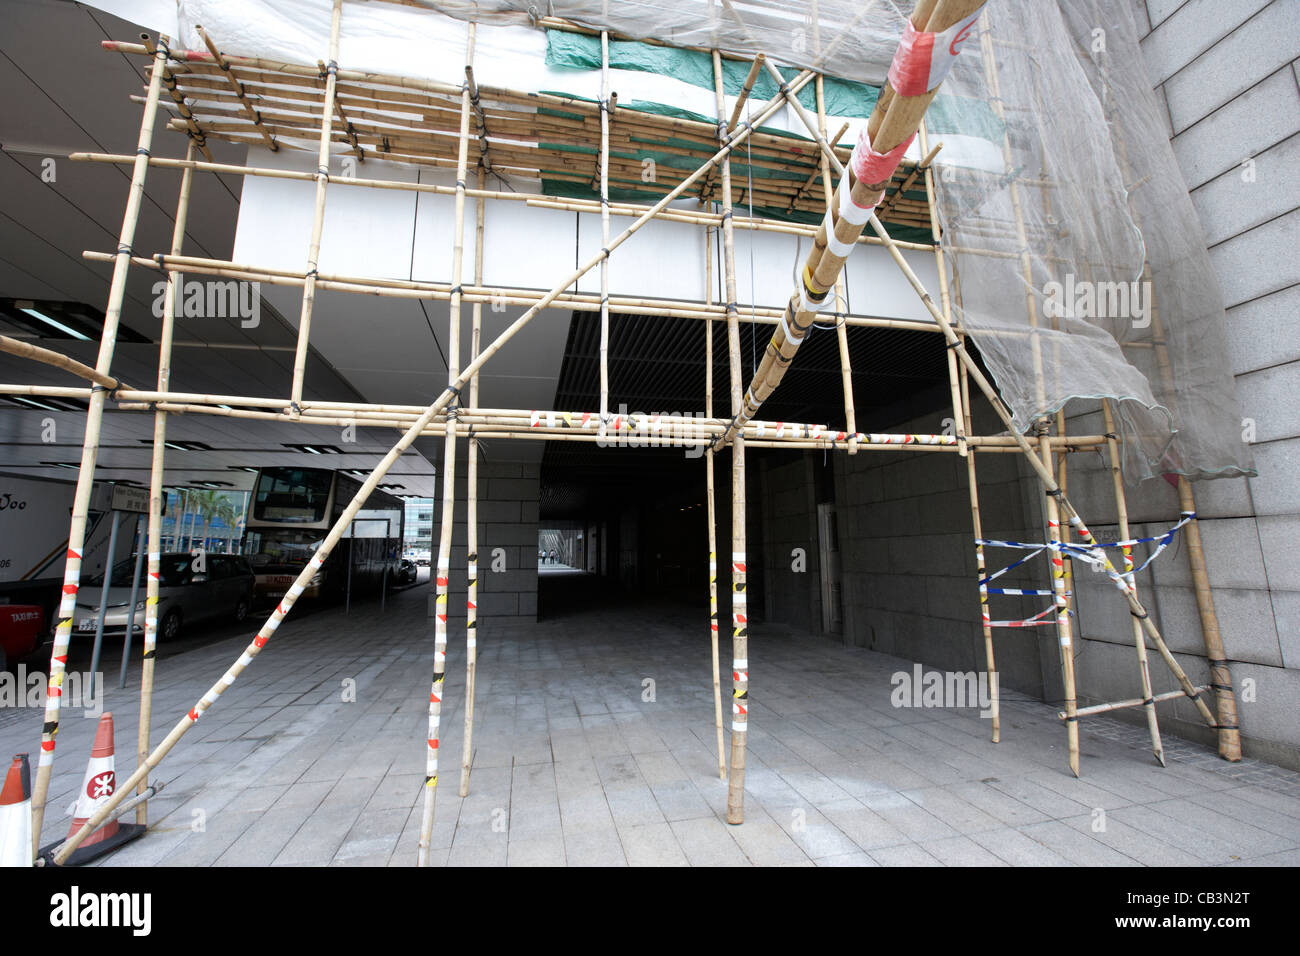 bamboo scaffolding on a building in hong kong island hksar china - Stock Image